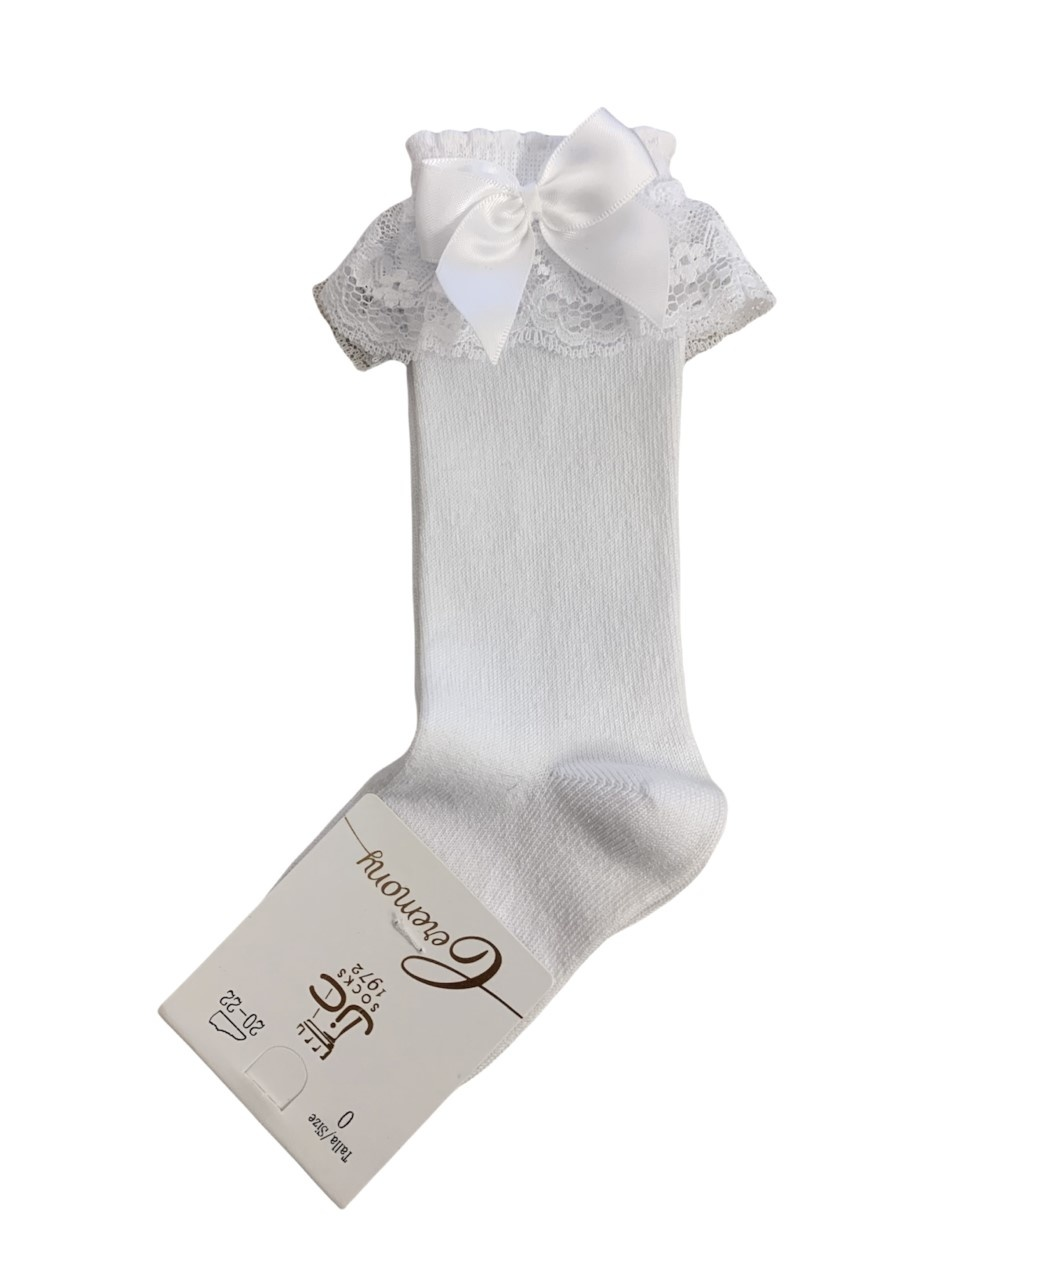 JC Socks JC Socks 56300 White Lace Frill Sock With Bow